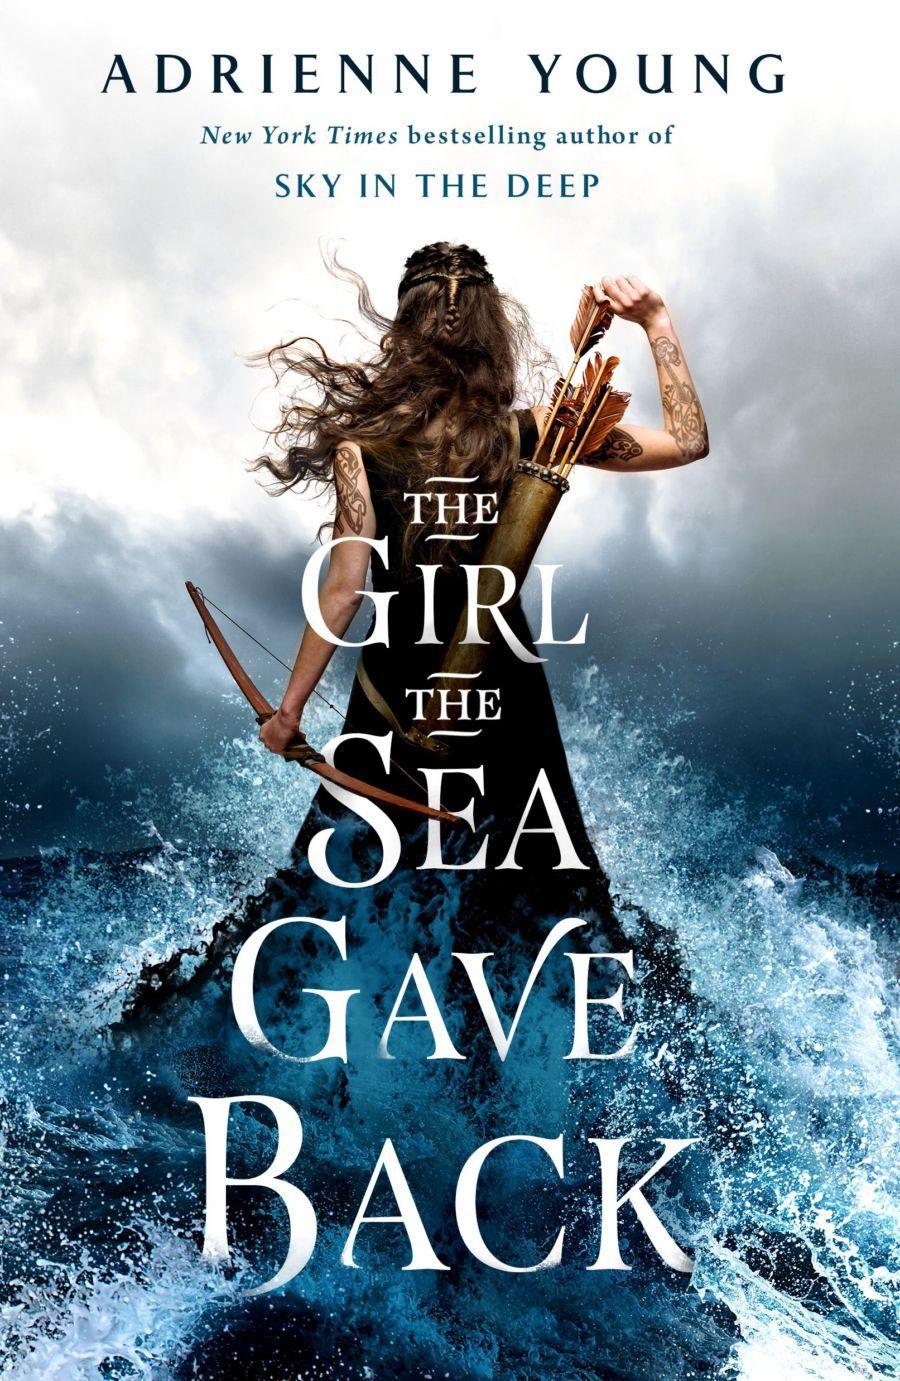 the-girl-the-sea-gave-back-cover.jpg